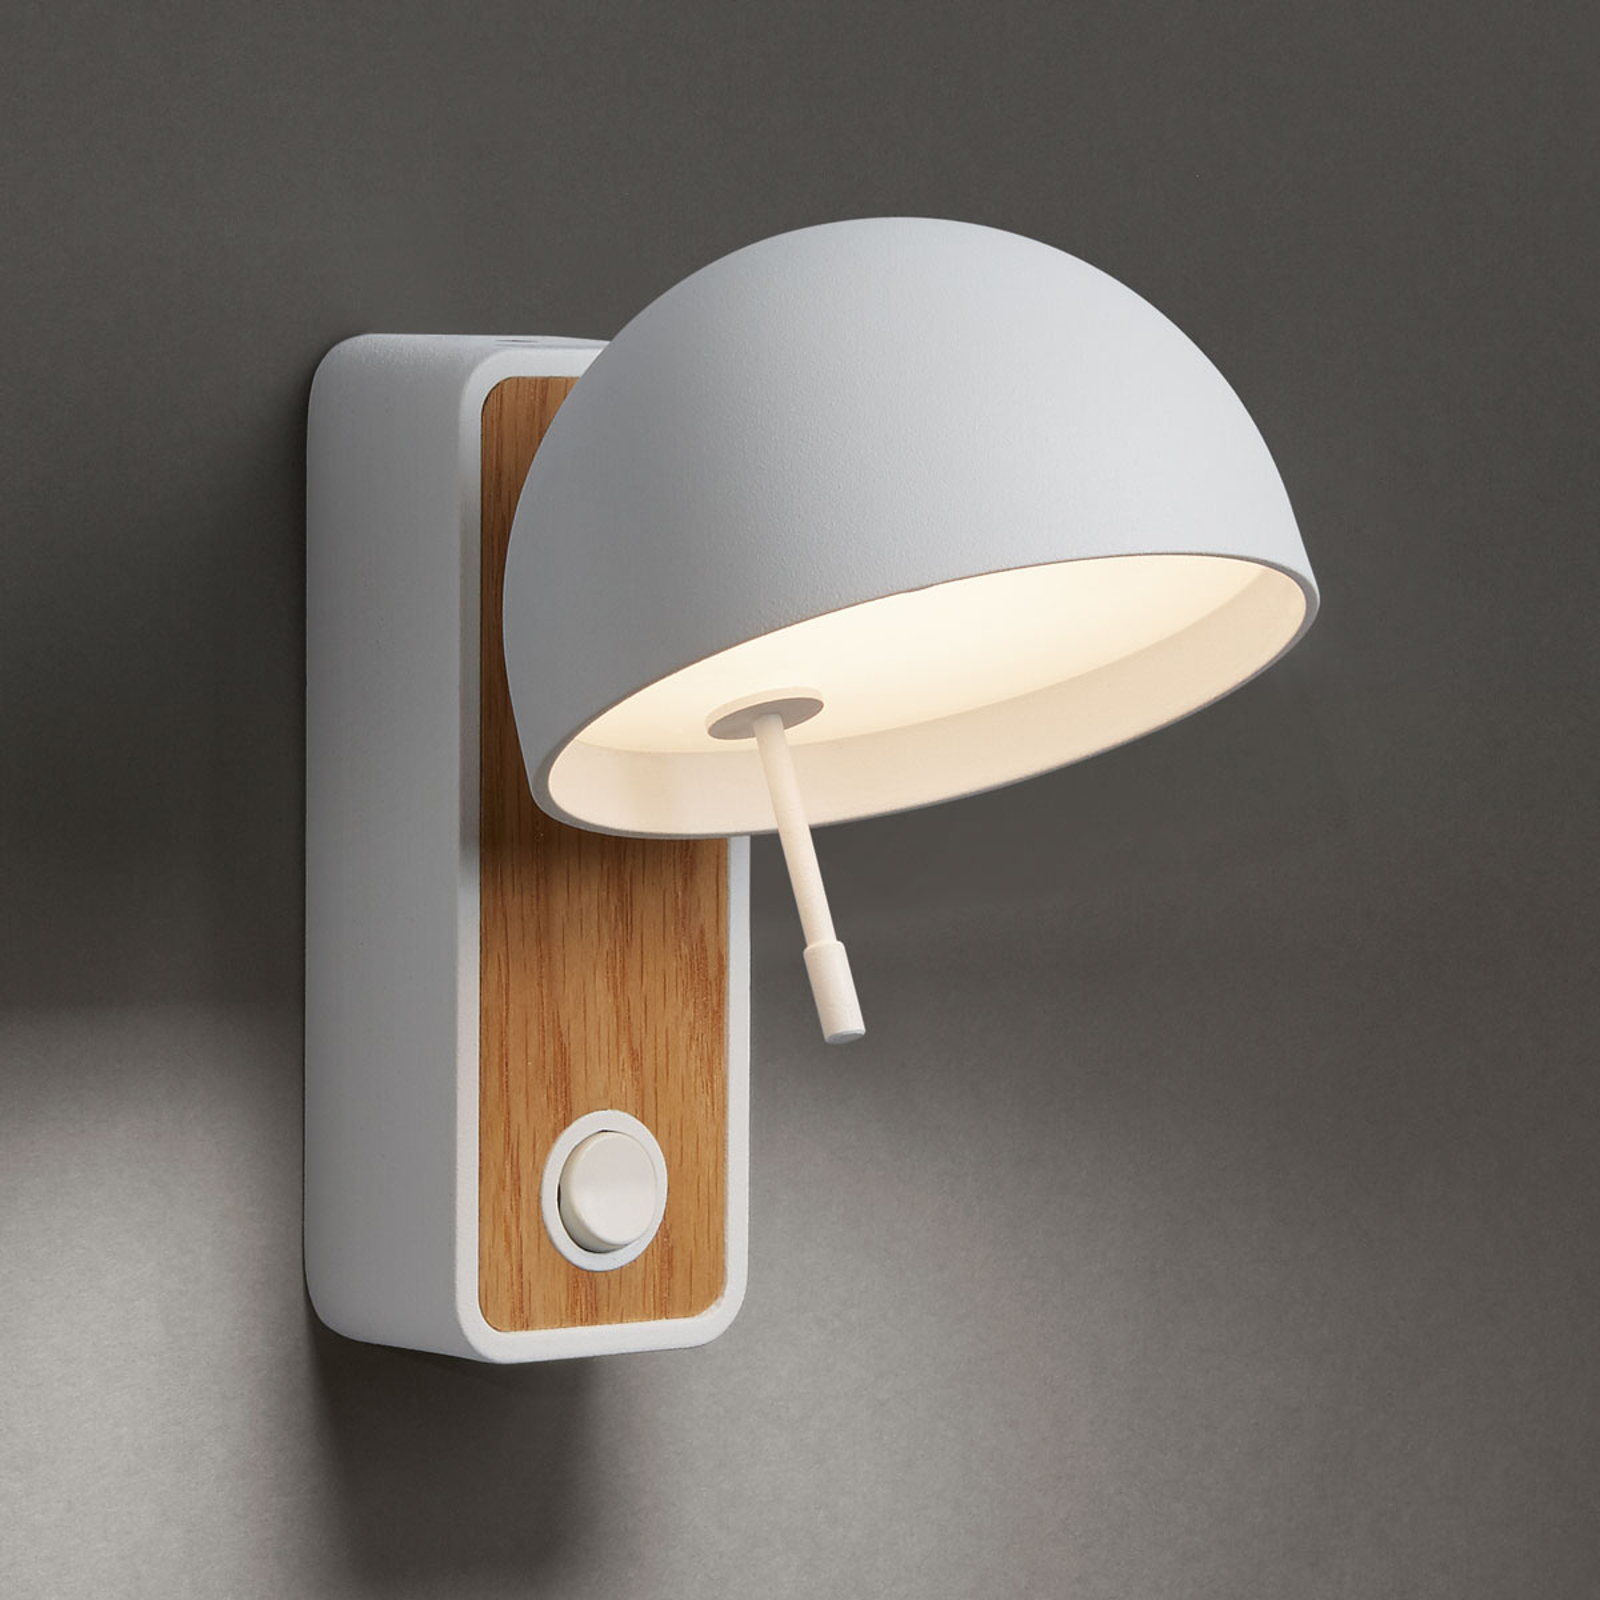 Bover Beddy A/01 LED-vegglampe, roterbar hvit/eik